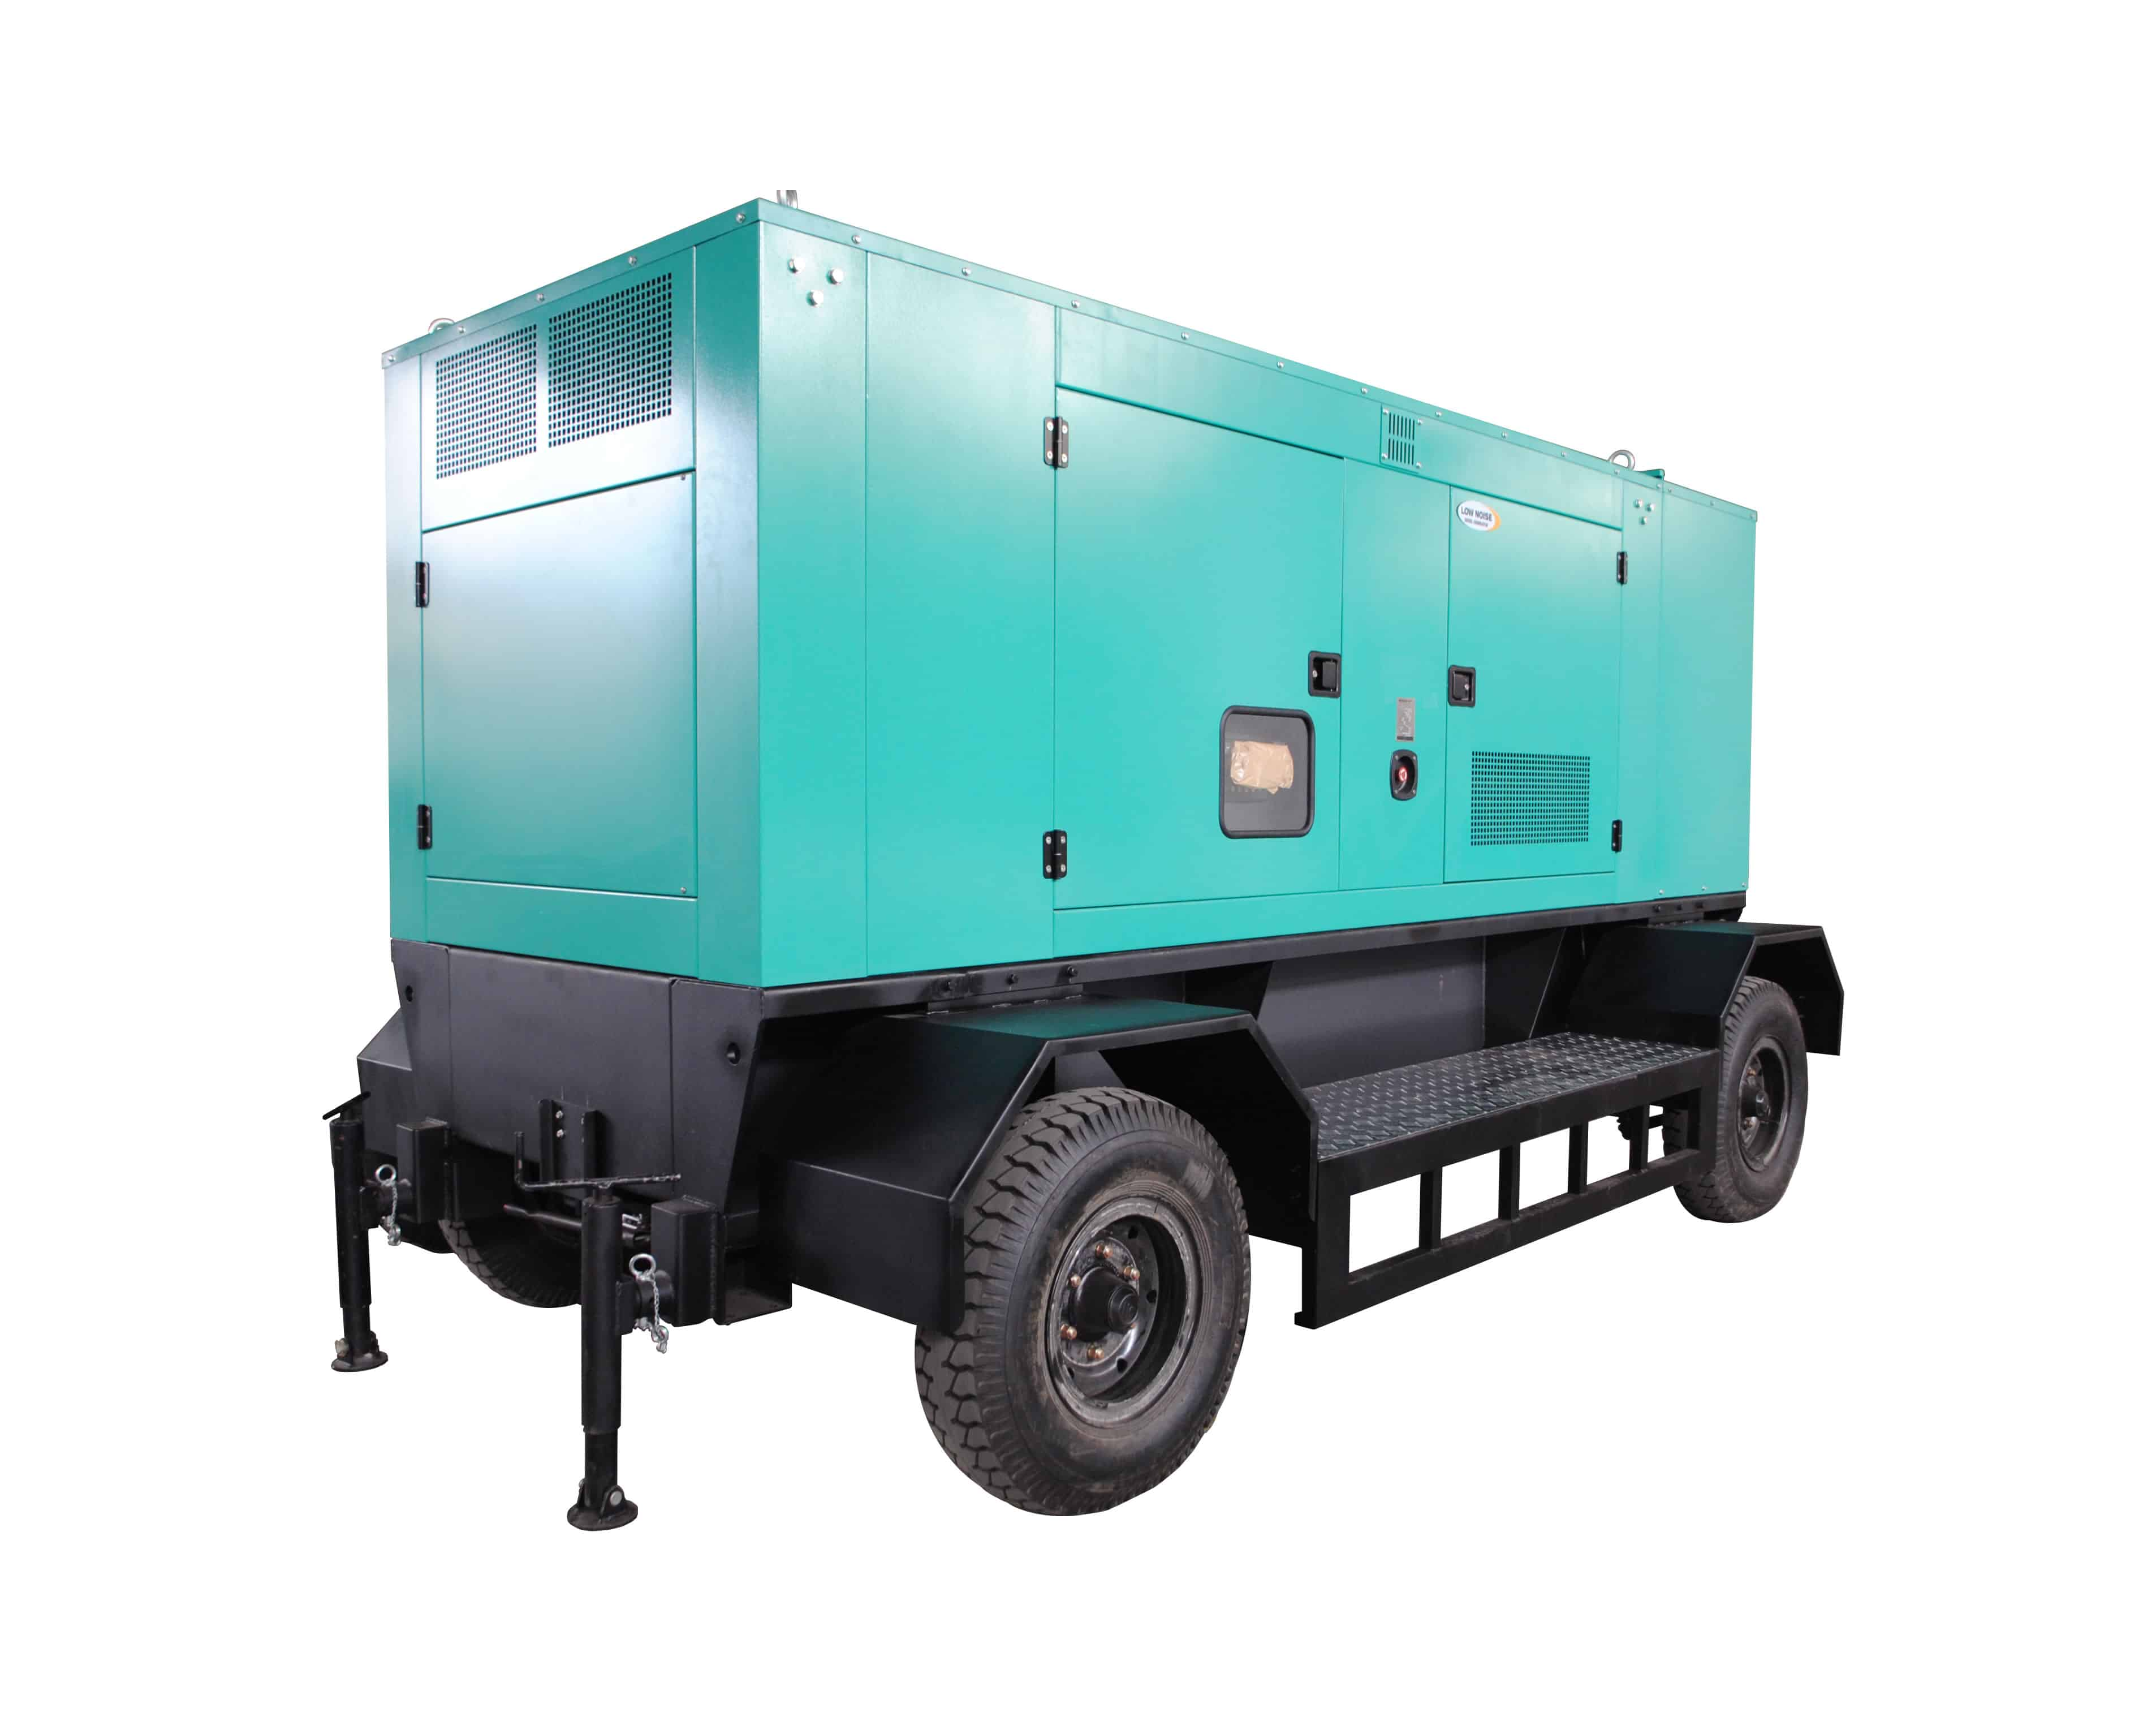 2 axles generator trailer